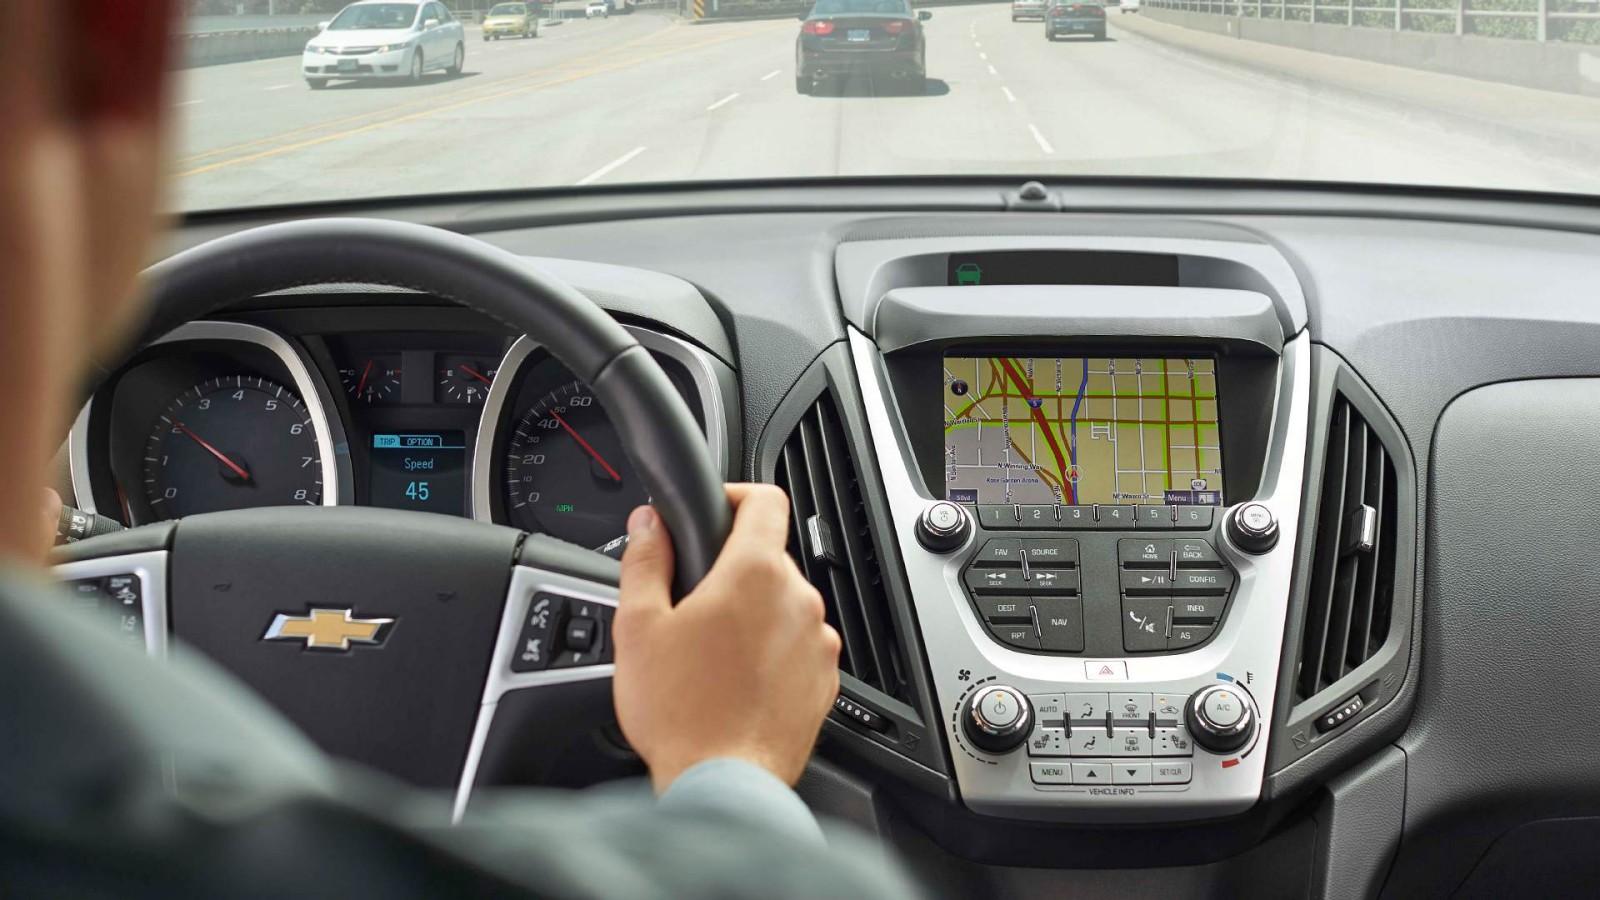 2016 Chevrolet Equinox Interior